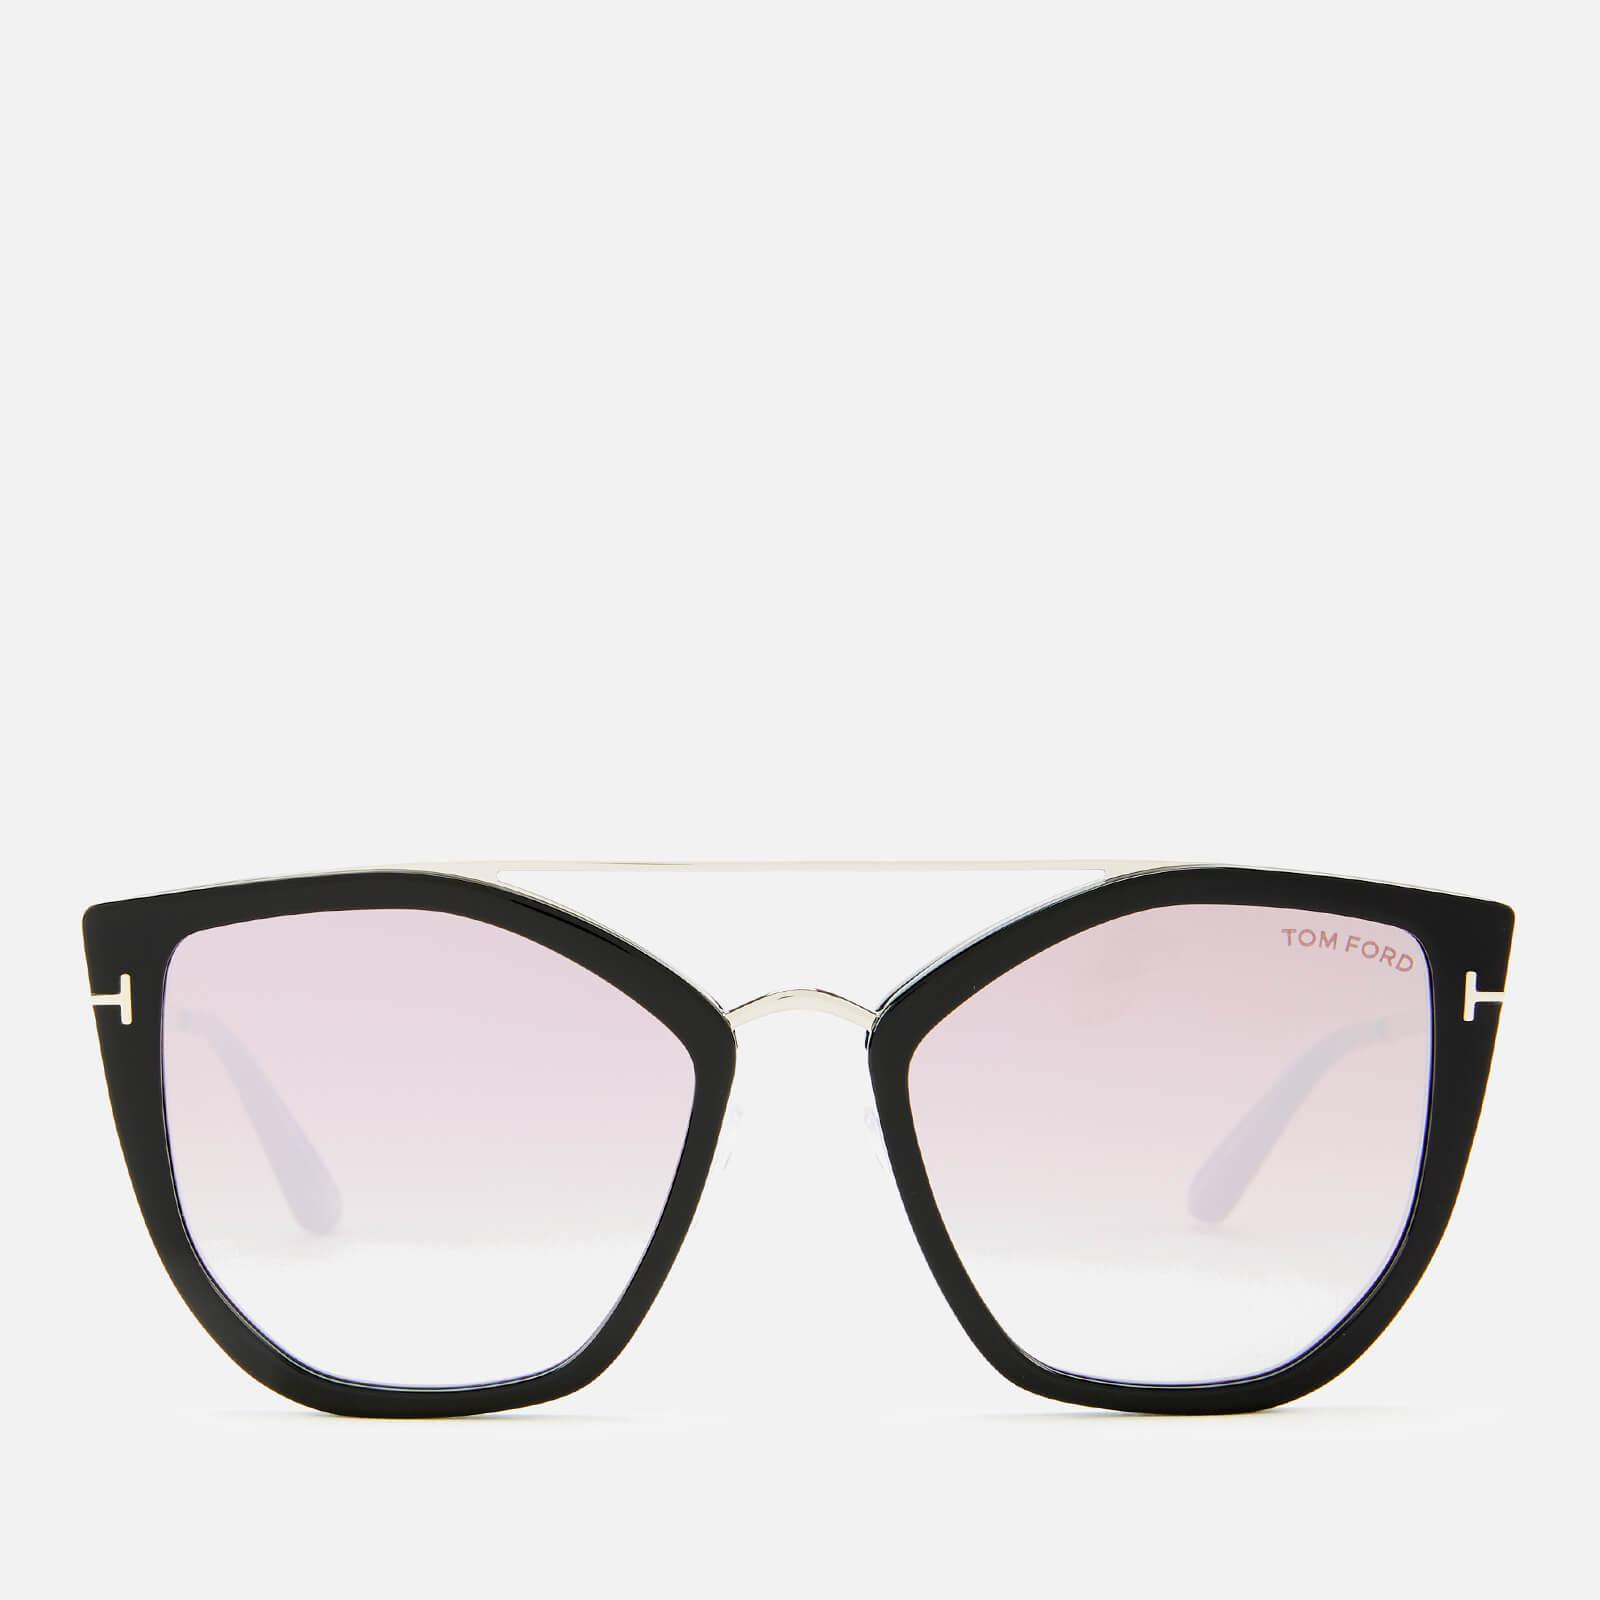 Tom Ford Women's Dahlia Sunglasses - Shiny Black/Gradient or Mirror Violet